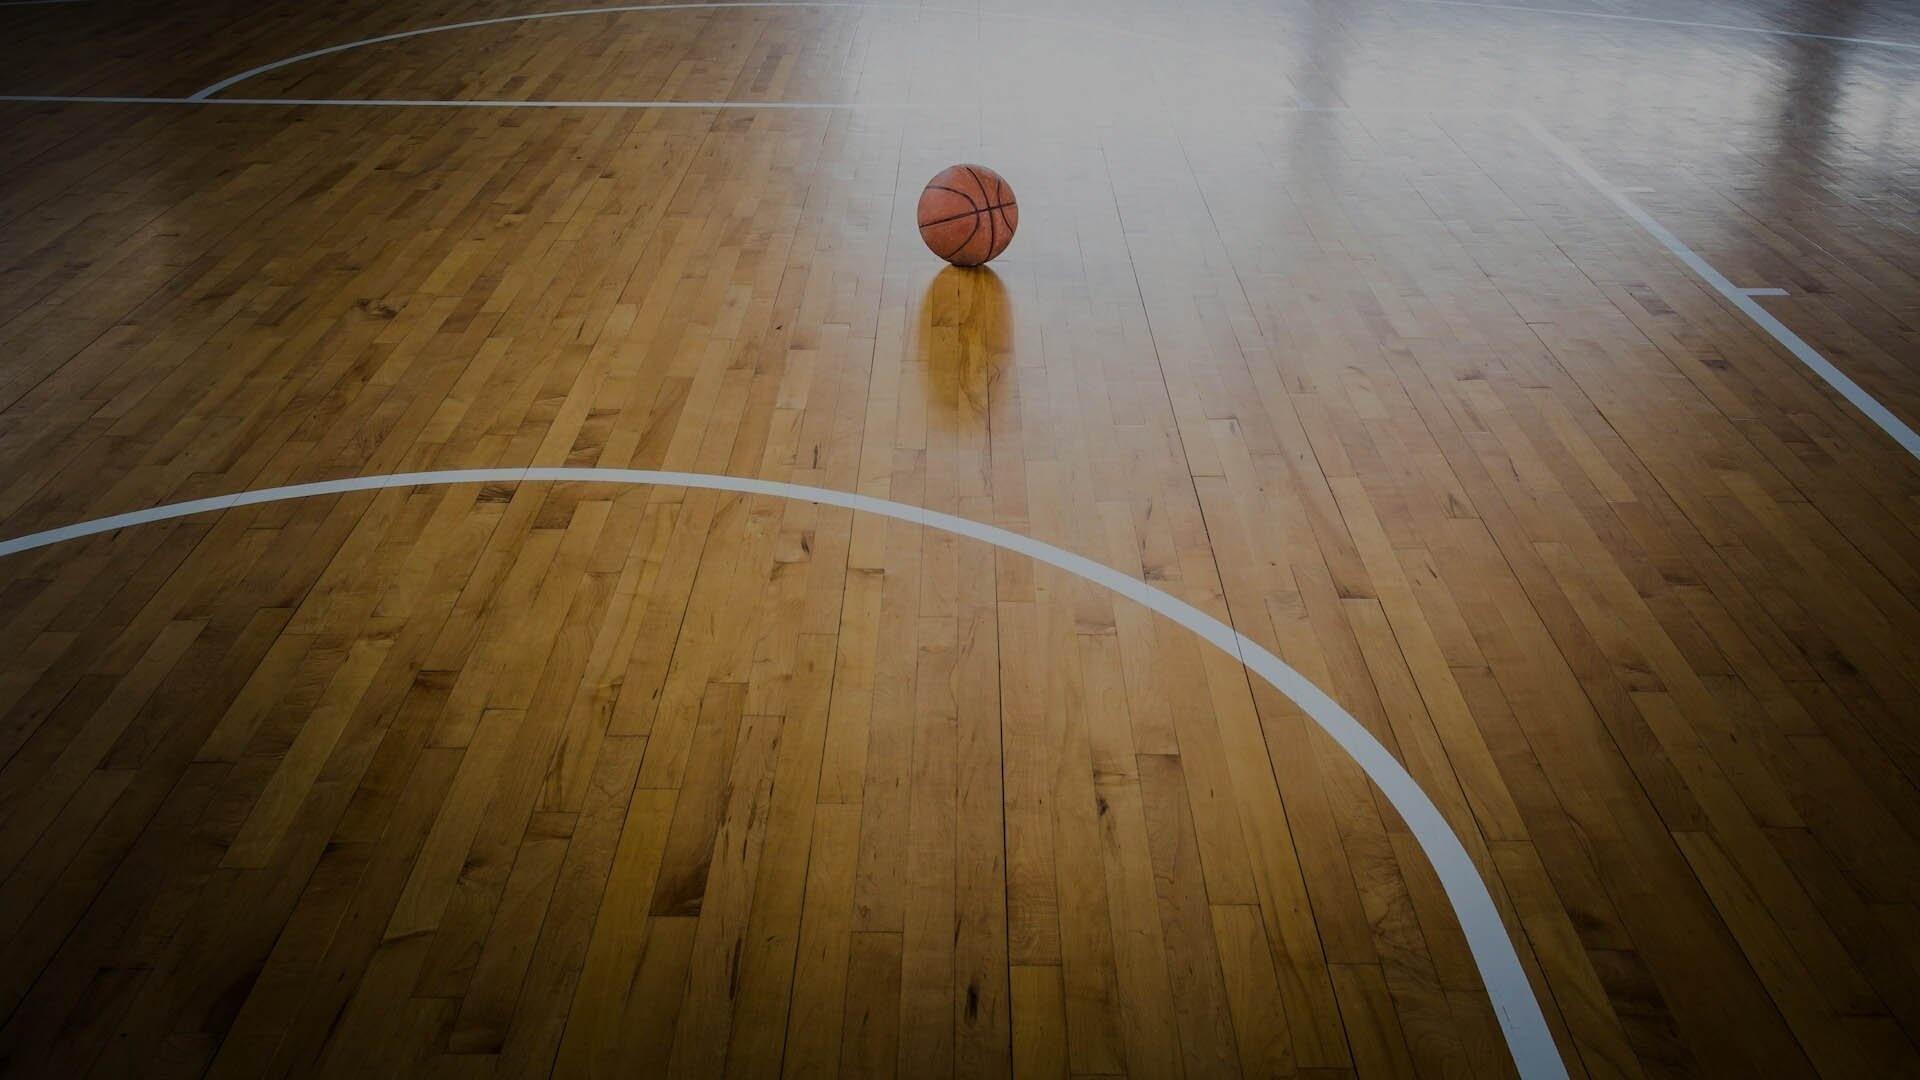 Basketball free background